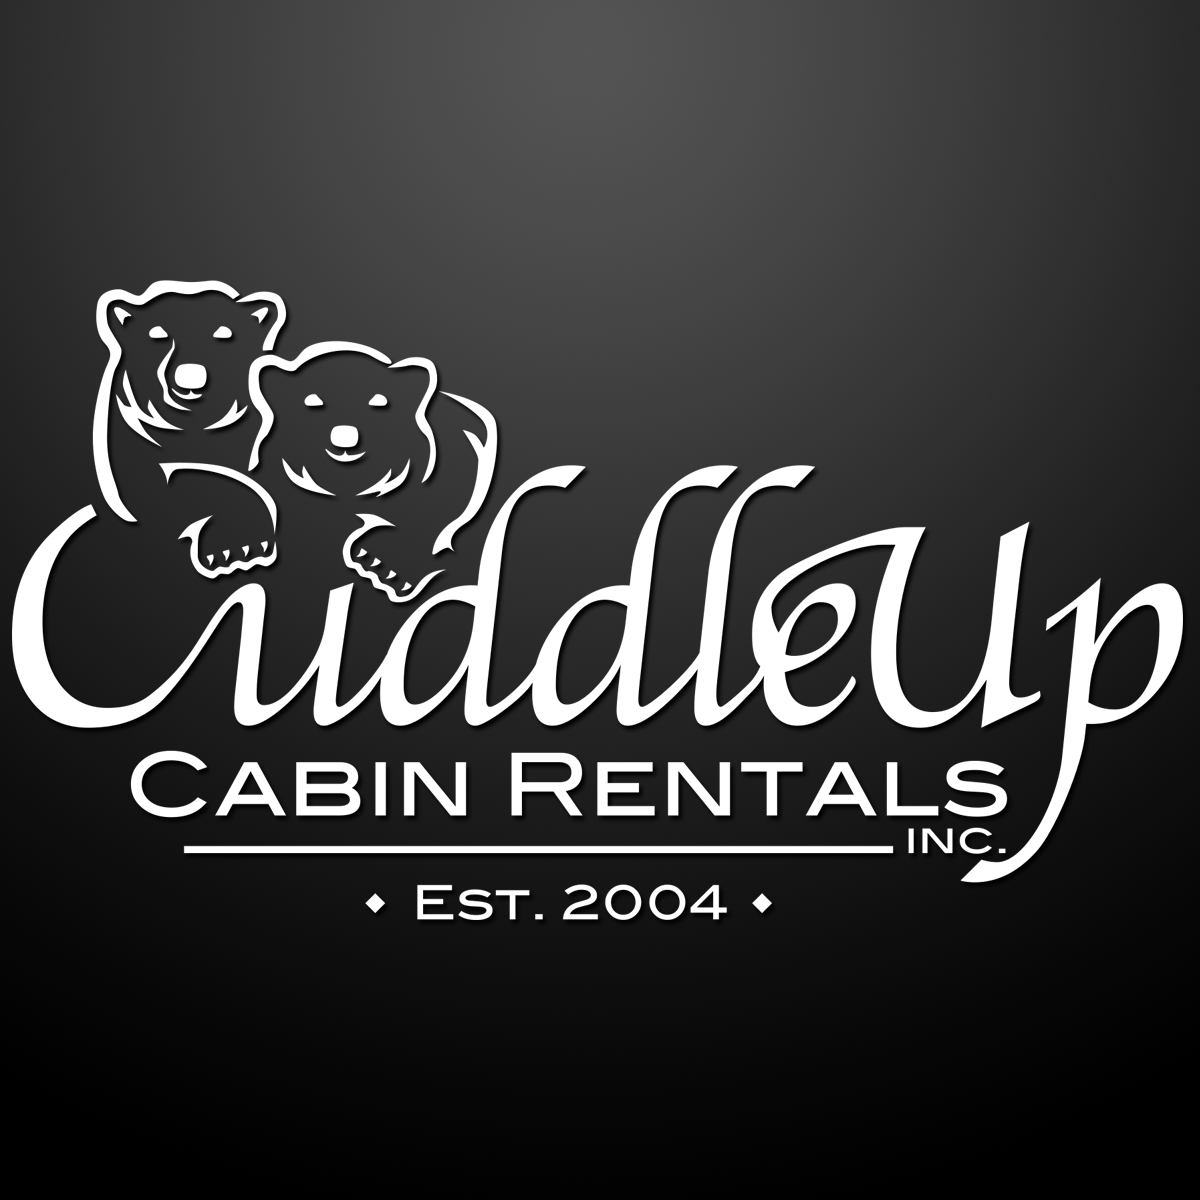 Cuddle Up Cabin Rentals | North Georgia Rental Cabins